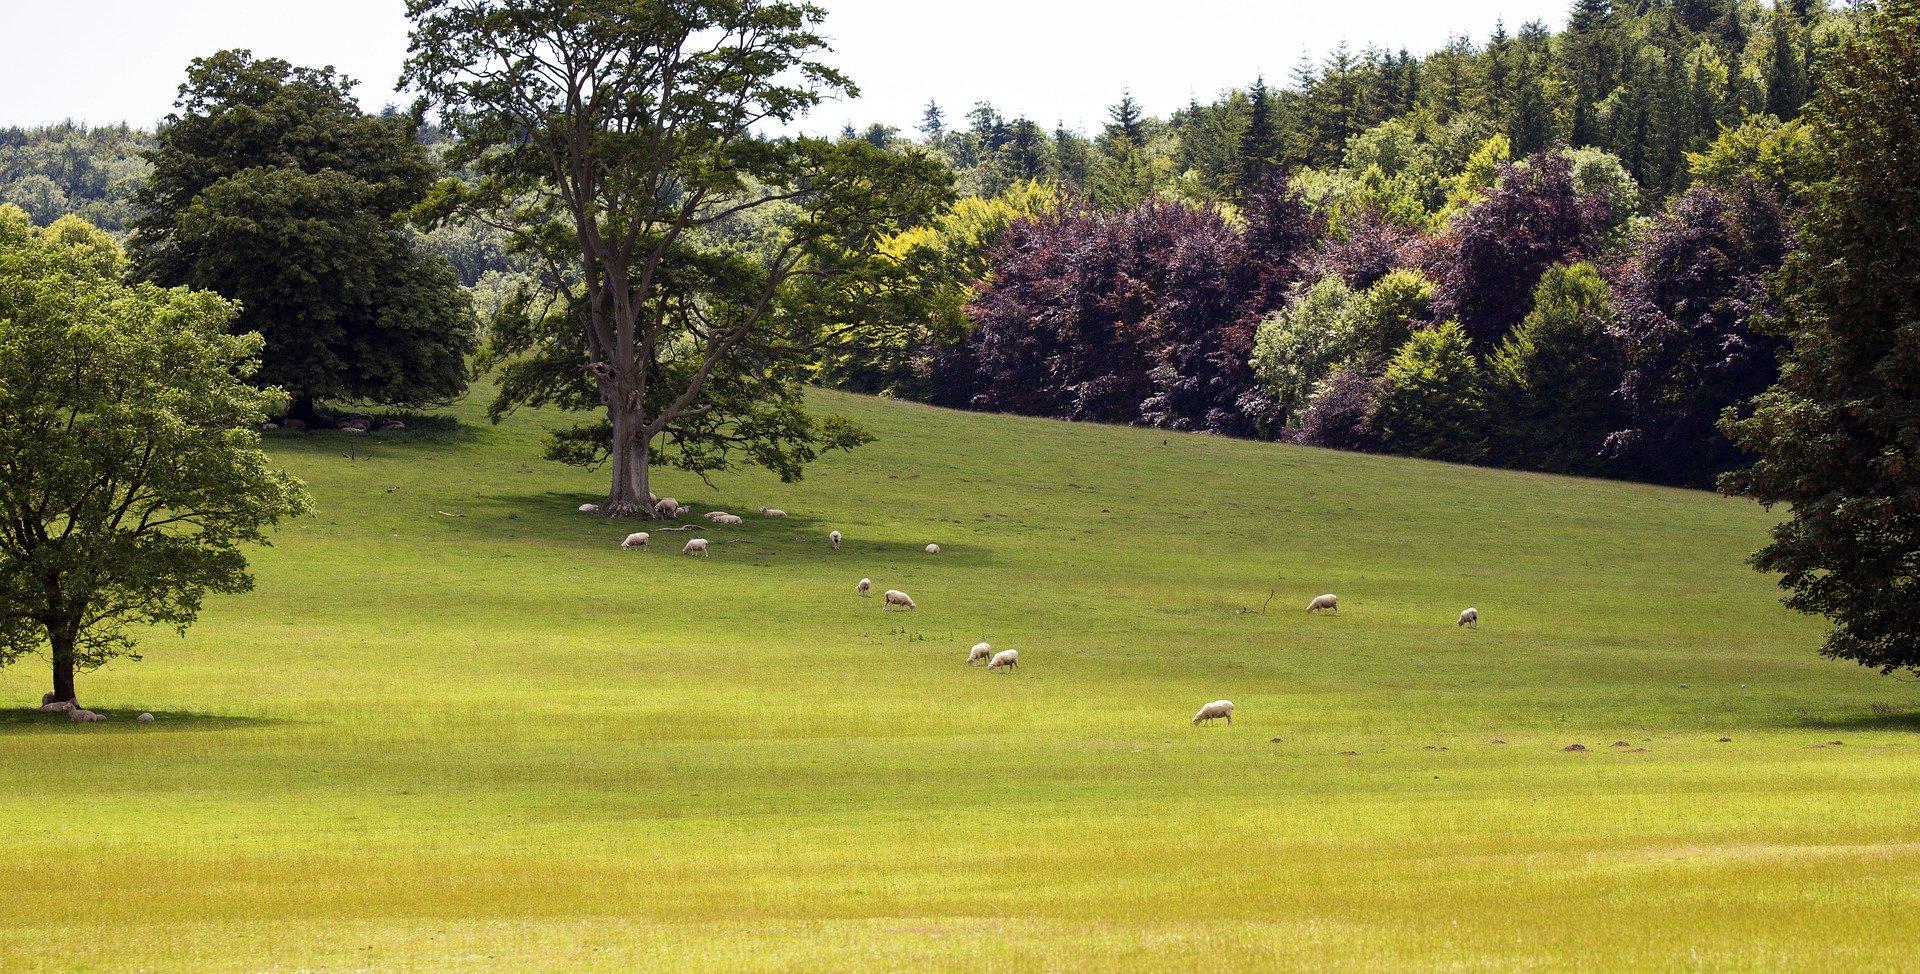 Countryside and sheep